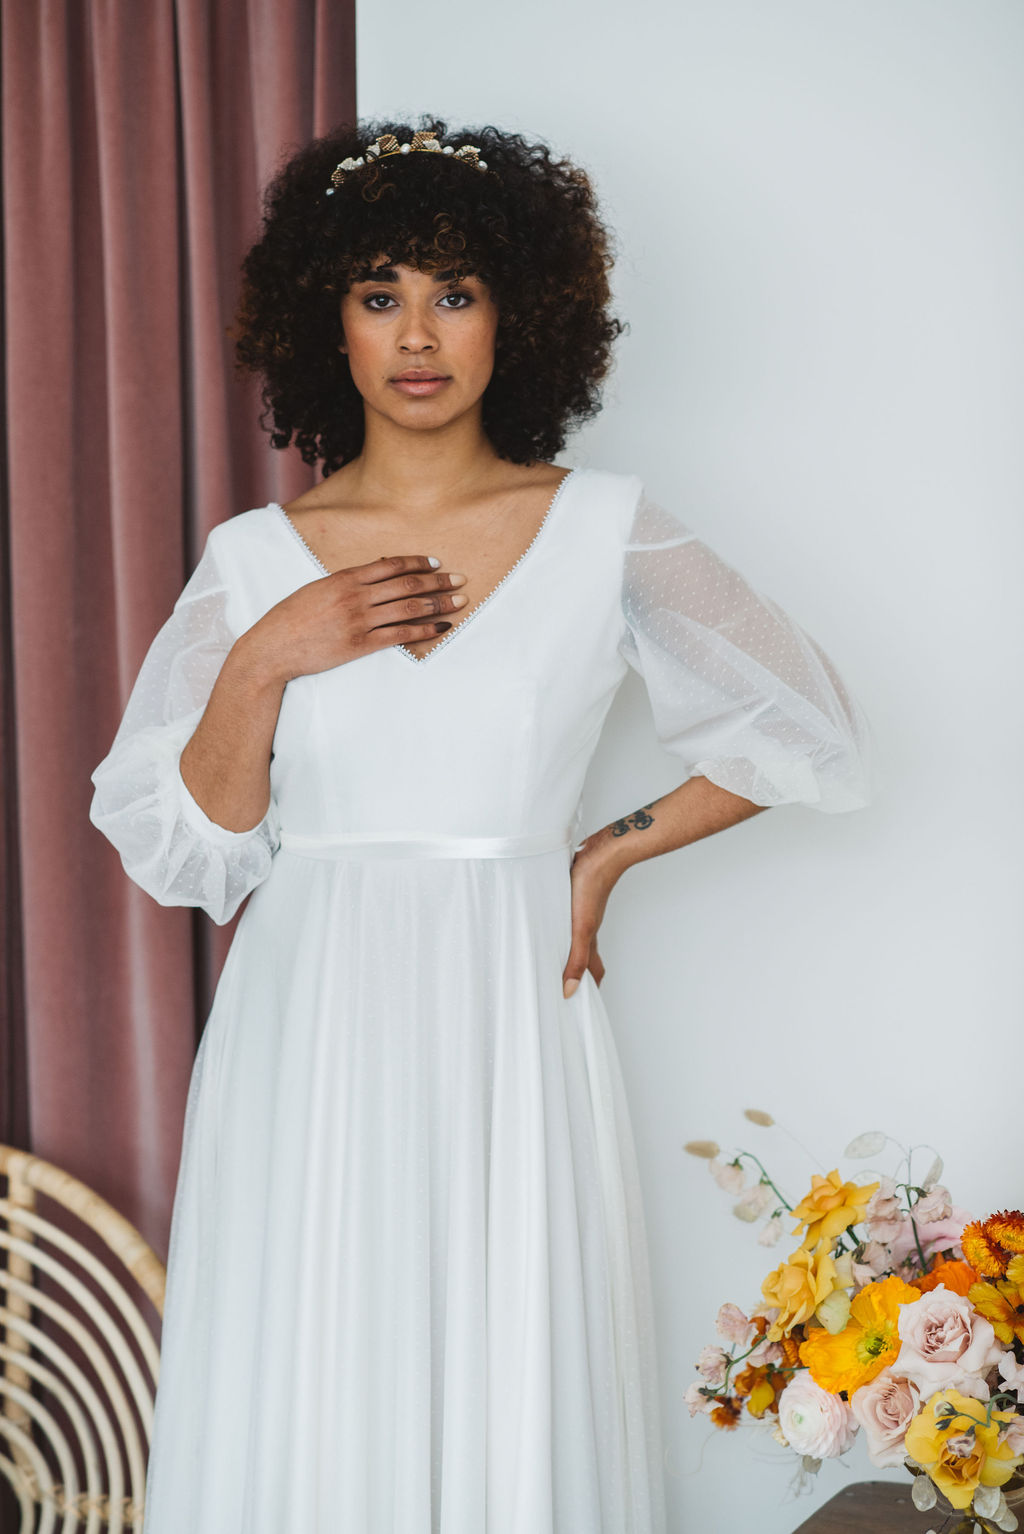 boho bride - polka dot wedding dress with sleeves